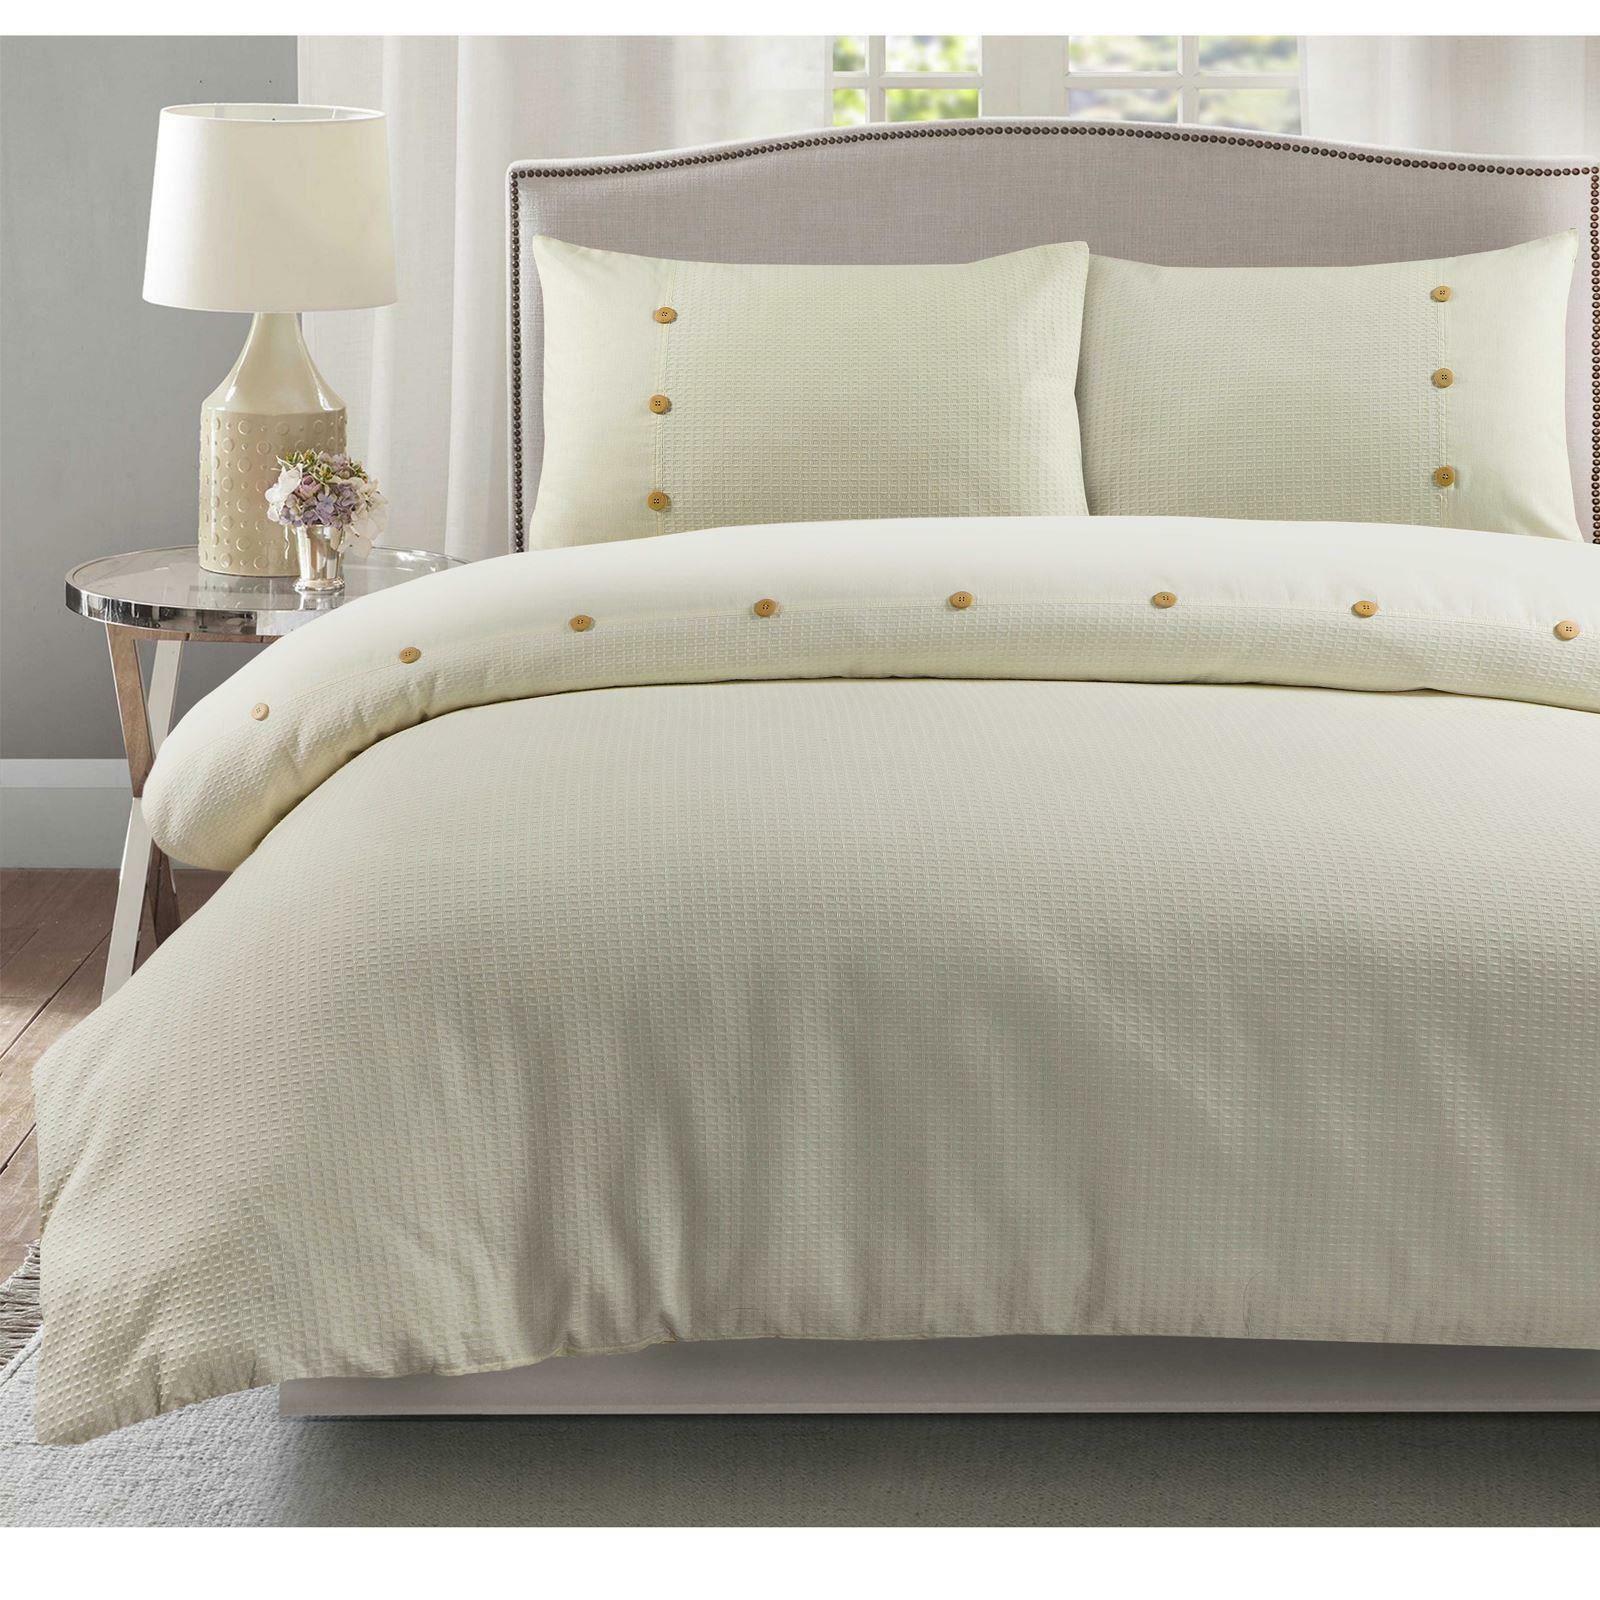 Shaun The Sheep Duvet Cover Set 140x200 Pillowcase 70x90 Cm 100 Cotton For Sale Online Ebay